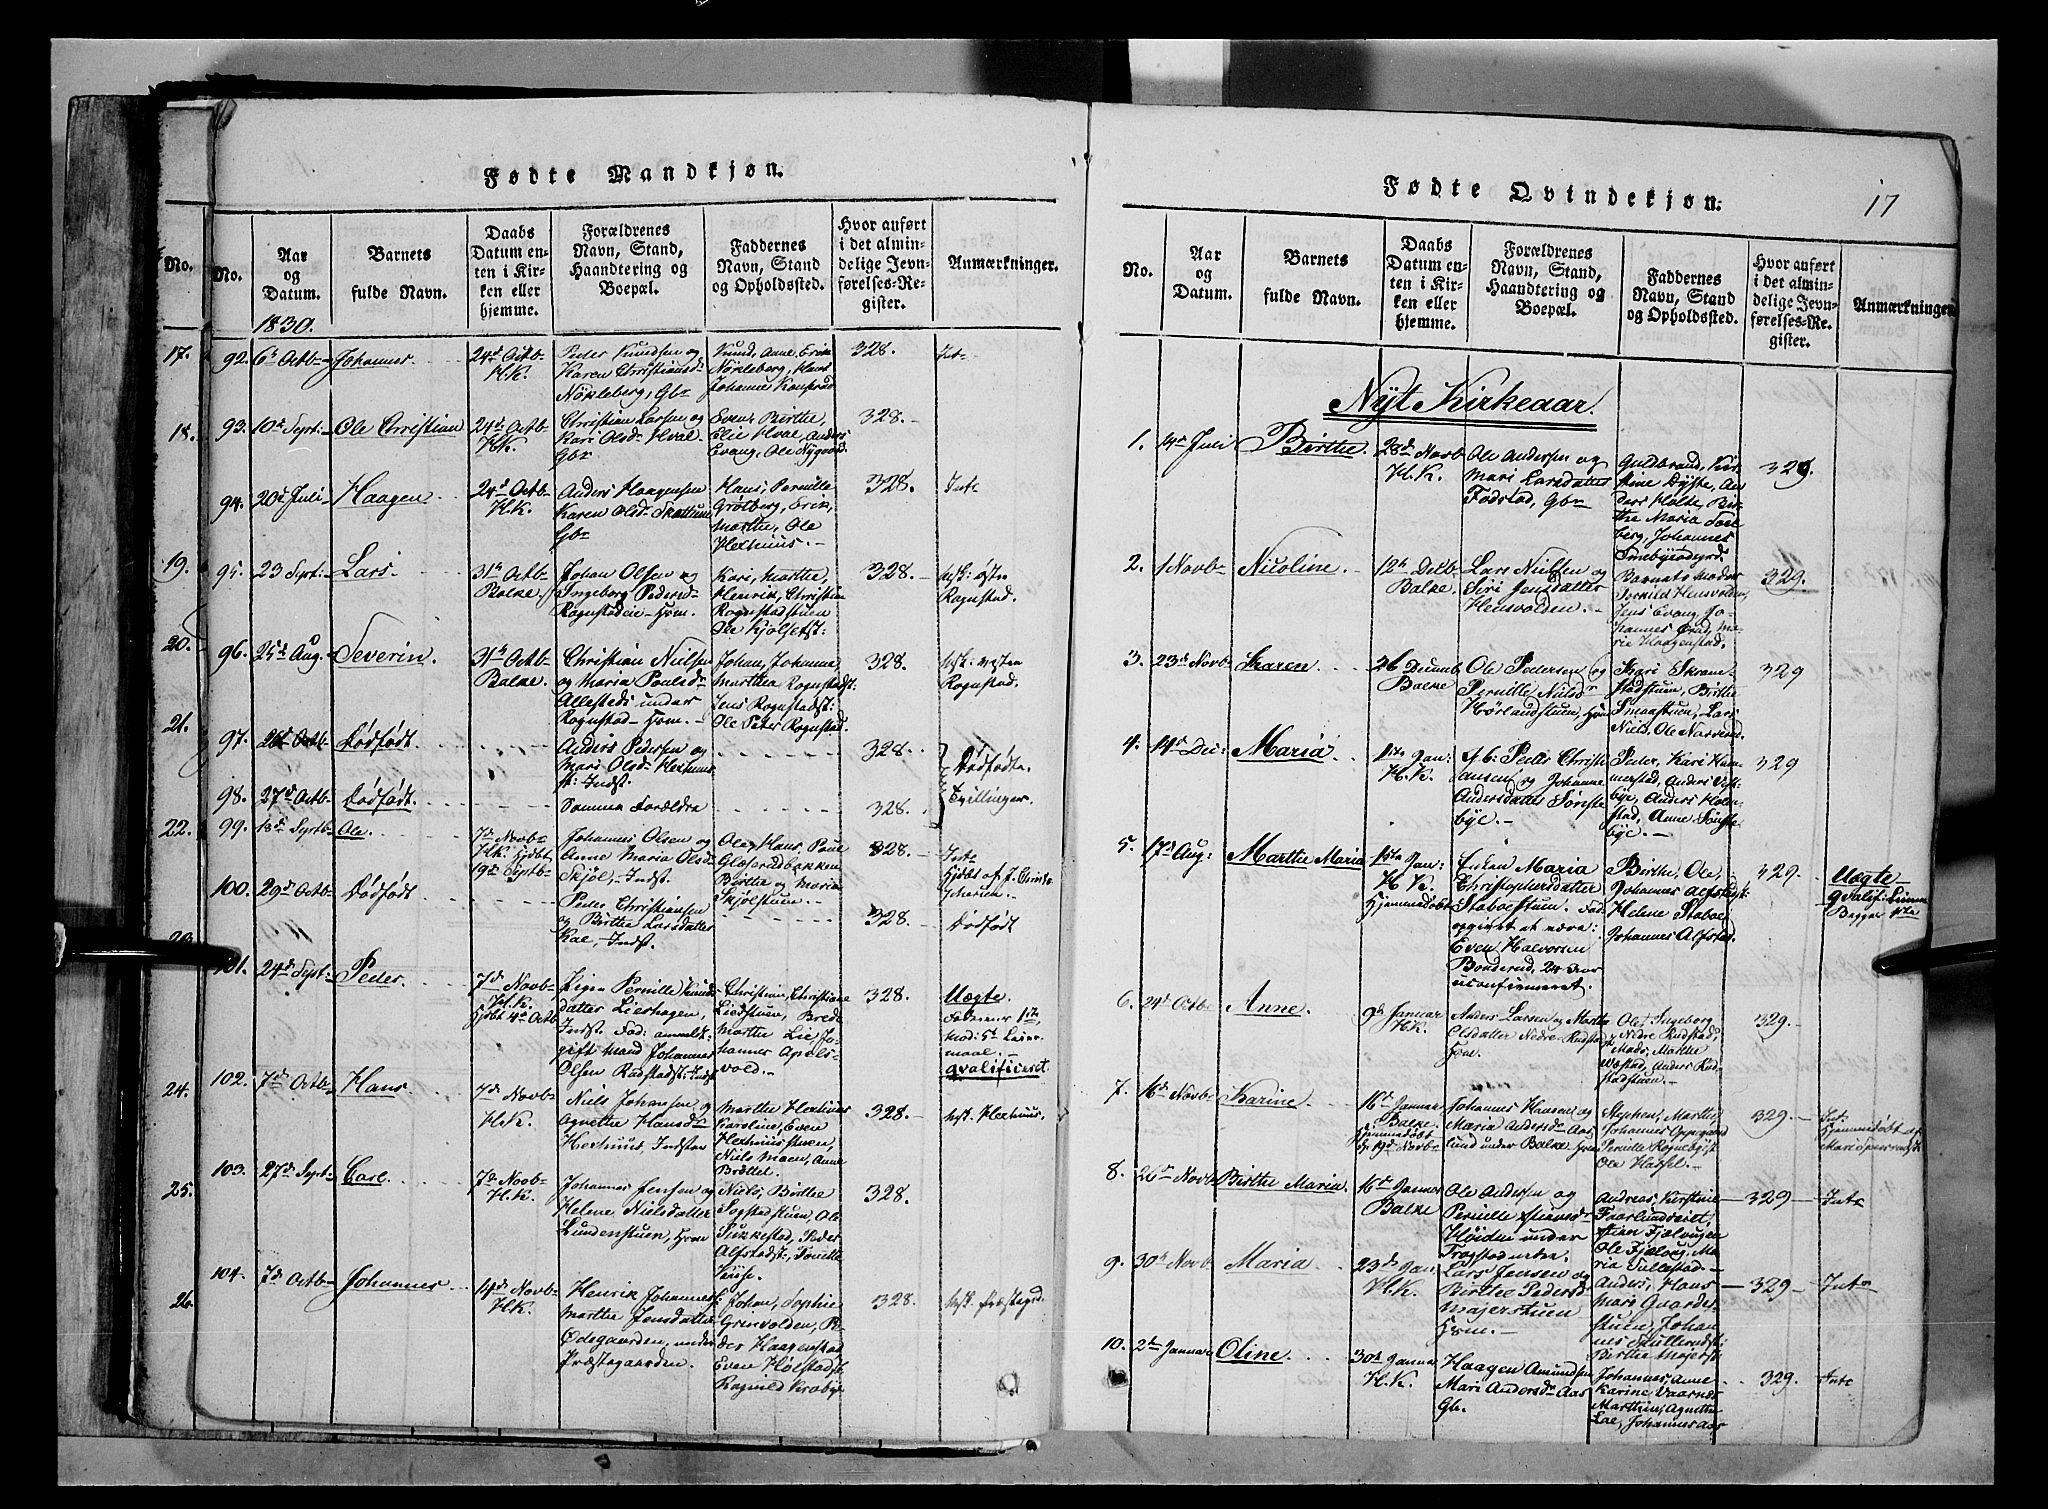 SAH, Østre Toten prestekontor, Ministerialbok nr. 1, 1828-1839, s. 17